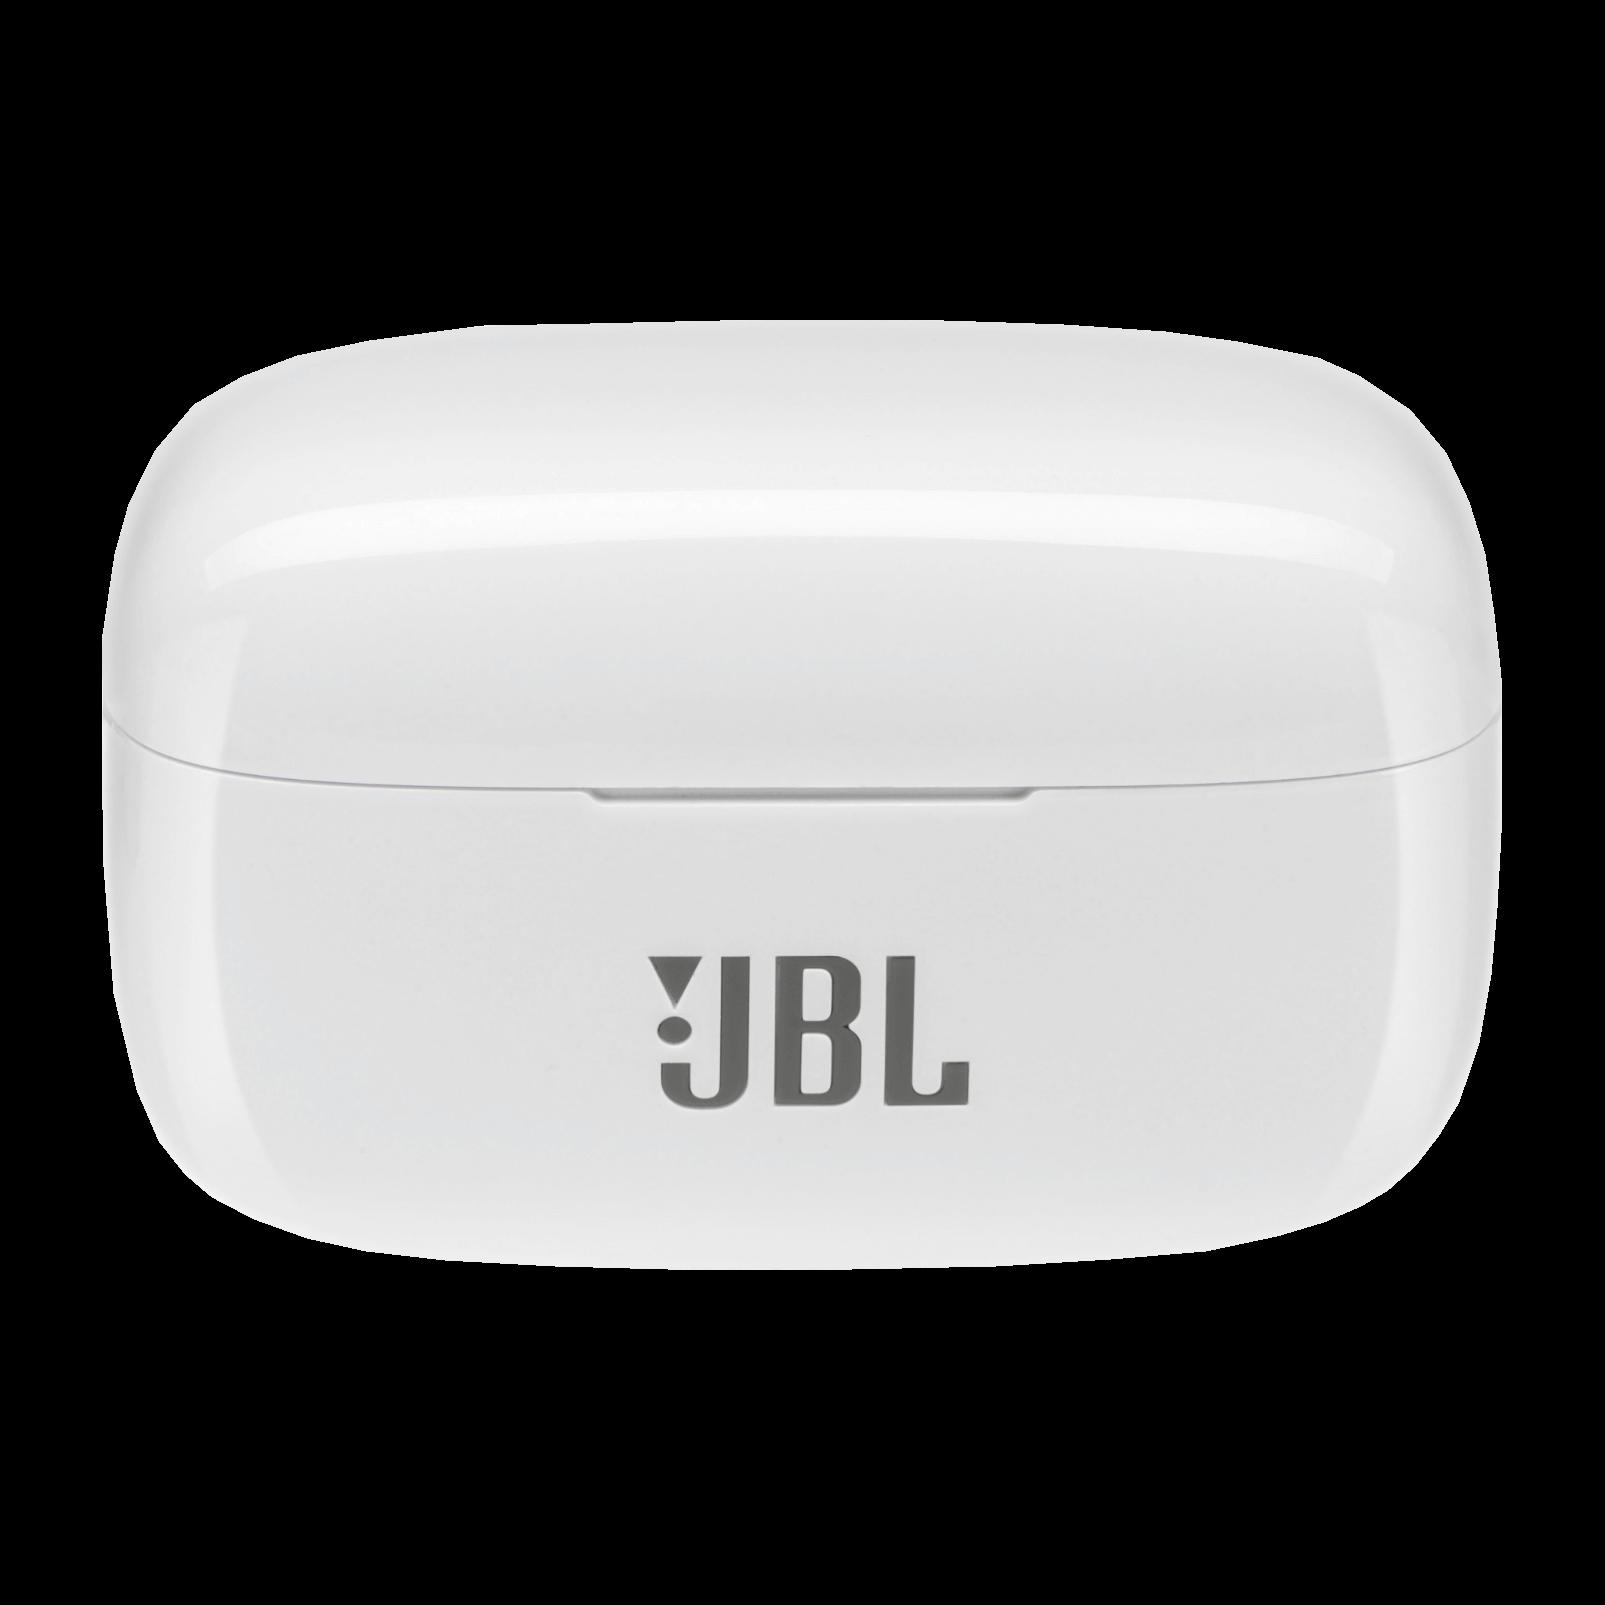 JBL LIVE 300TWS - White Gloss - True wireless in-ear headphones with Smart Ambient - Detailshot 4